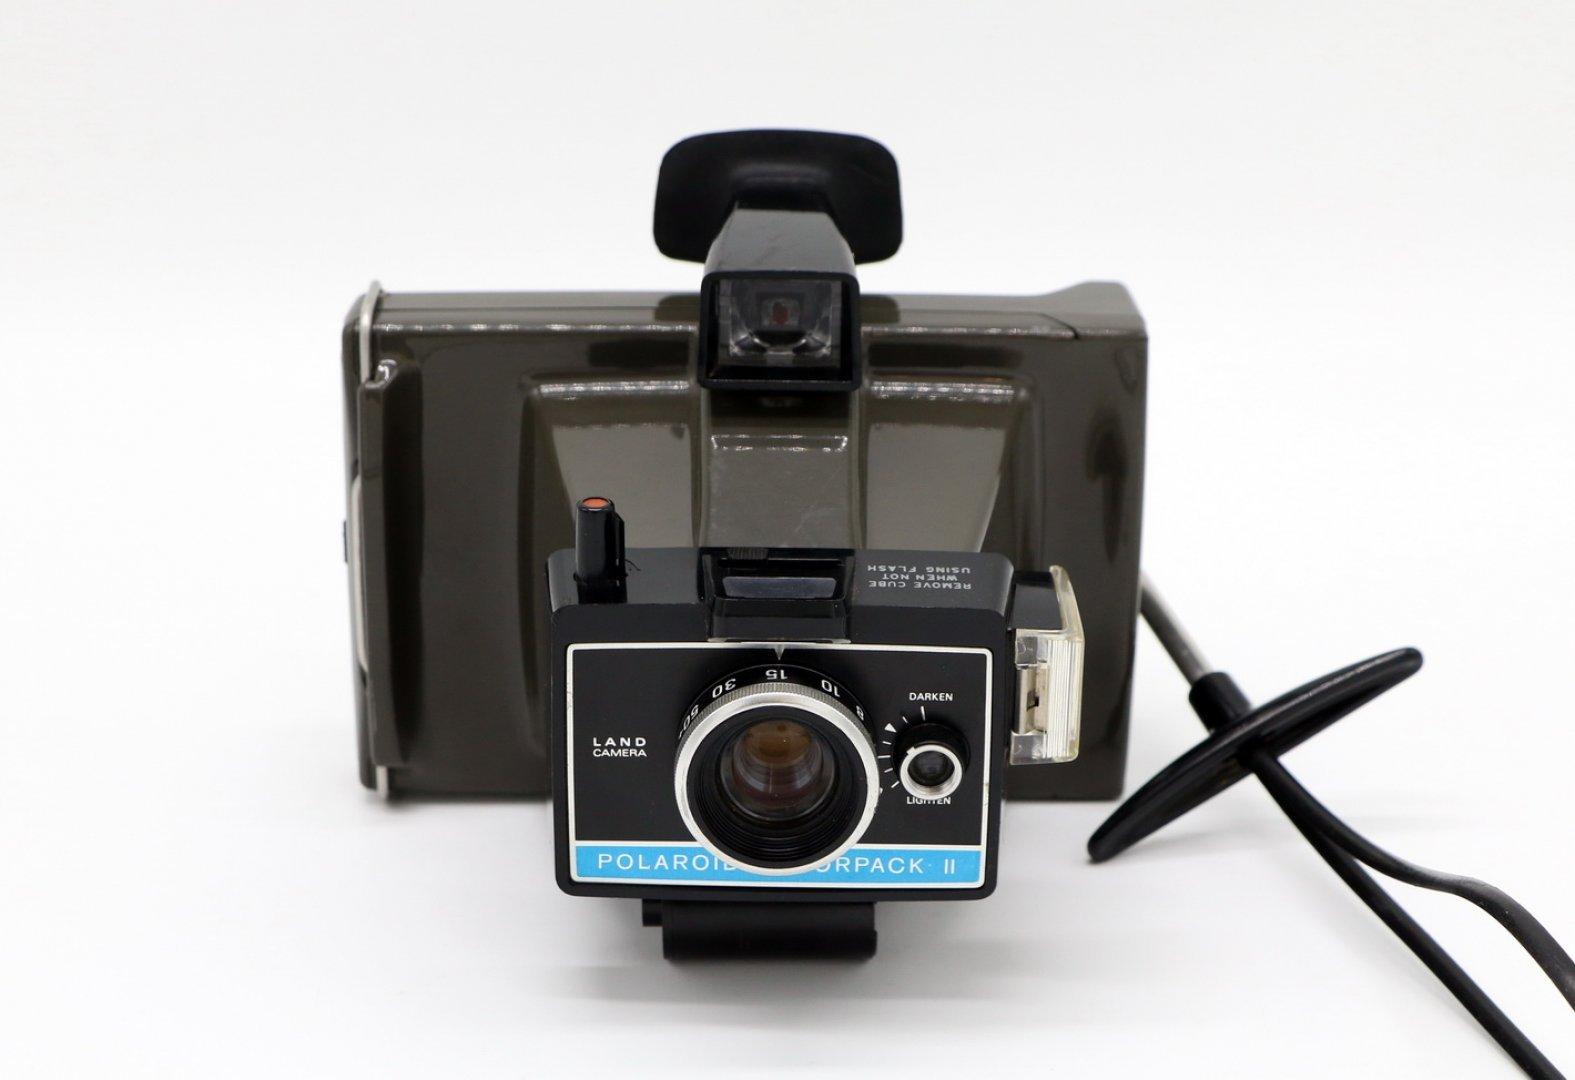 polaroid colorpack ii usa 1969 fotocccp ru 2 490. Black Bedroom Furniture Sets. Home Design Ideas